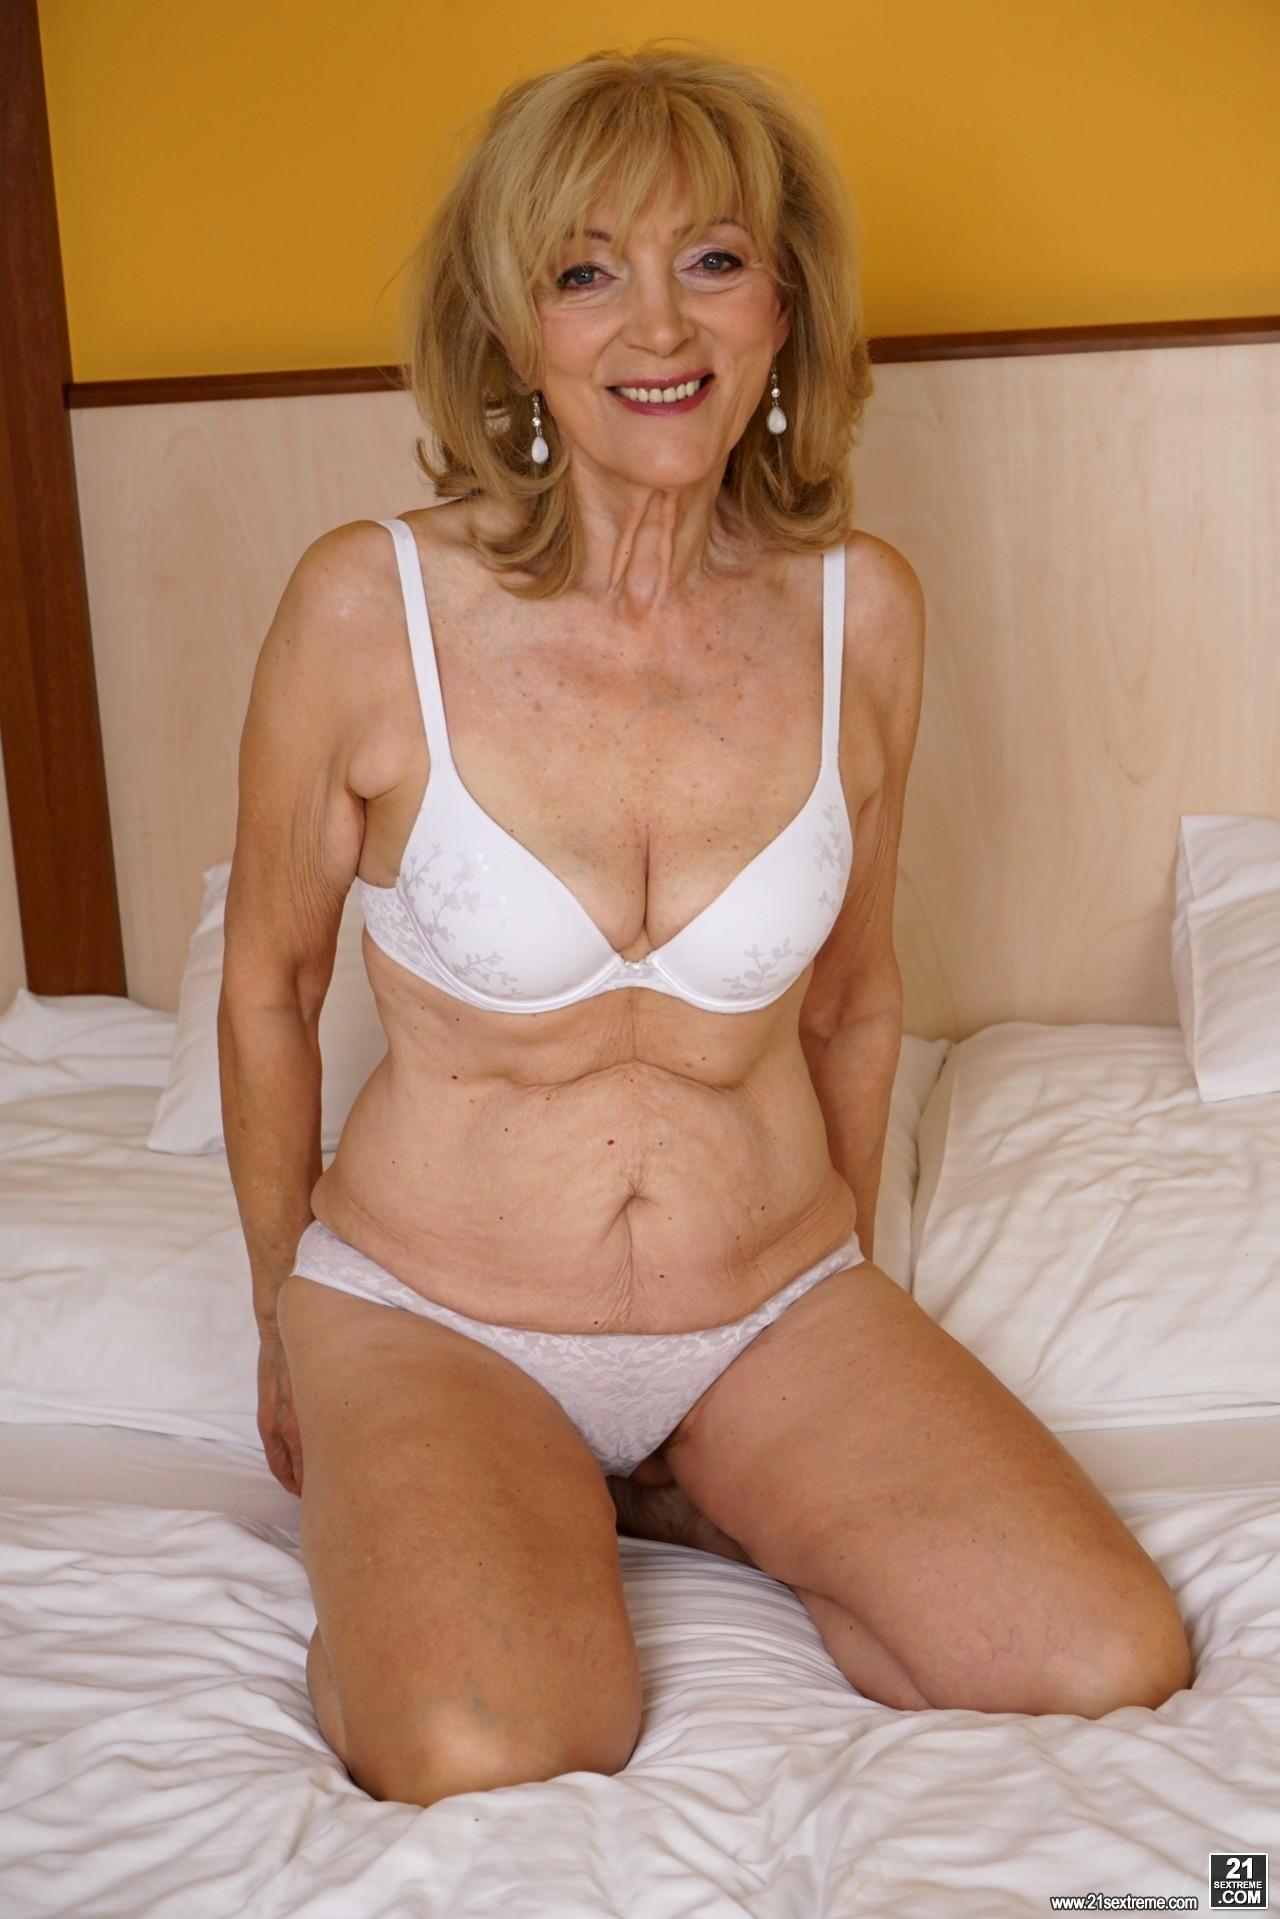 Mature beauty granny torrie Sexy granny photos